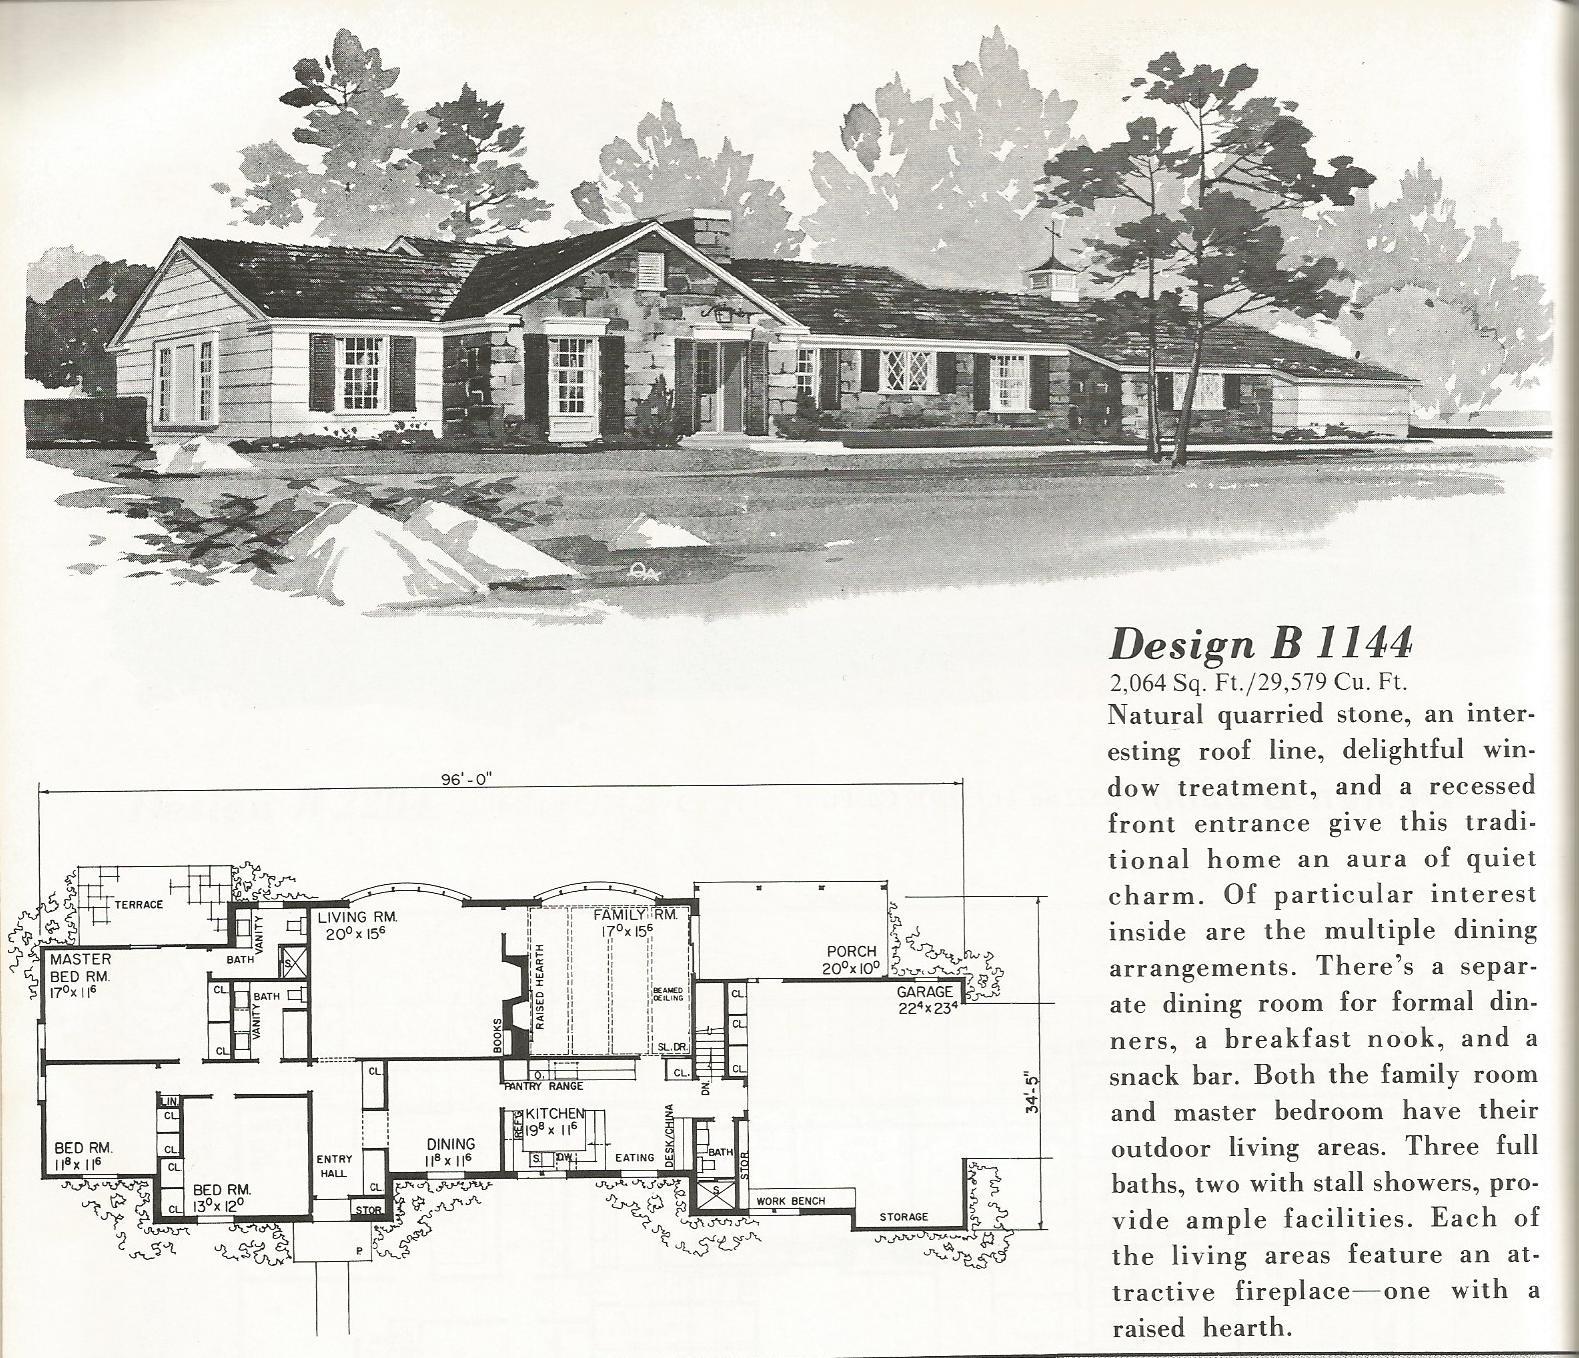 Vintage house plans 1144 antique alter ego for Retro house plans